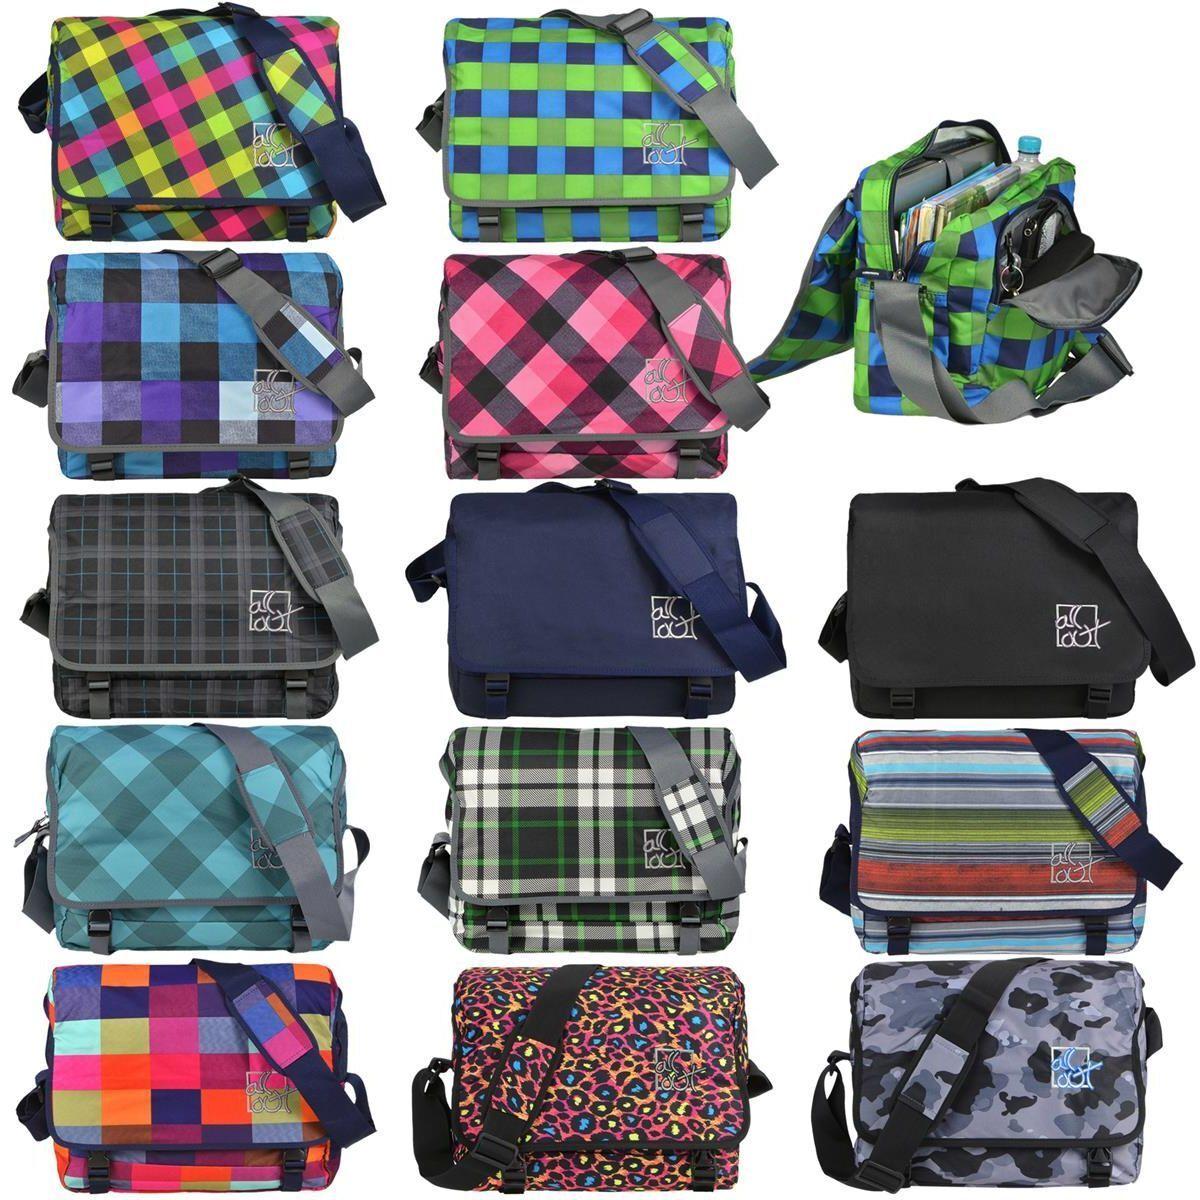 Borsa a tracolla borsa scolastica Borsa Spalla Shoulder Bag Borsa Scuola All Out